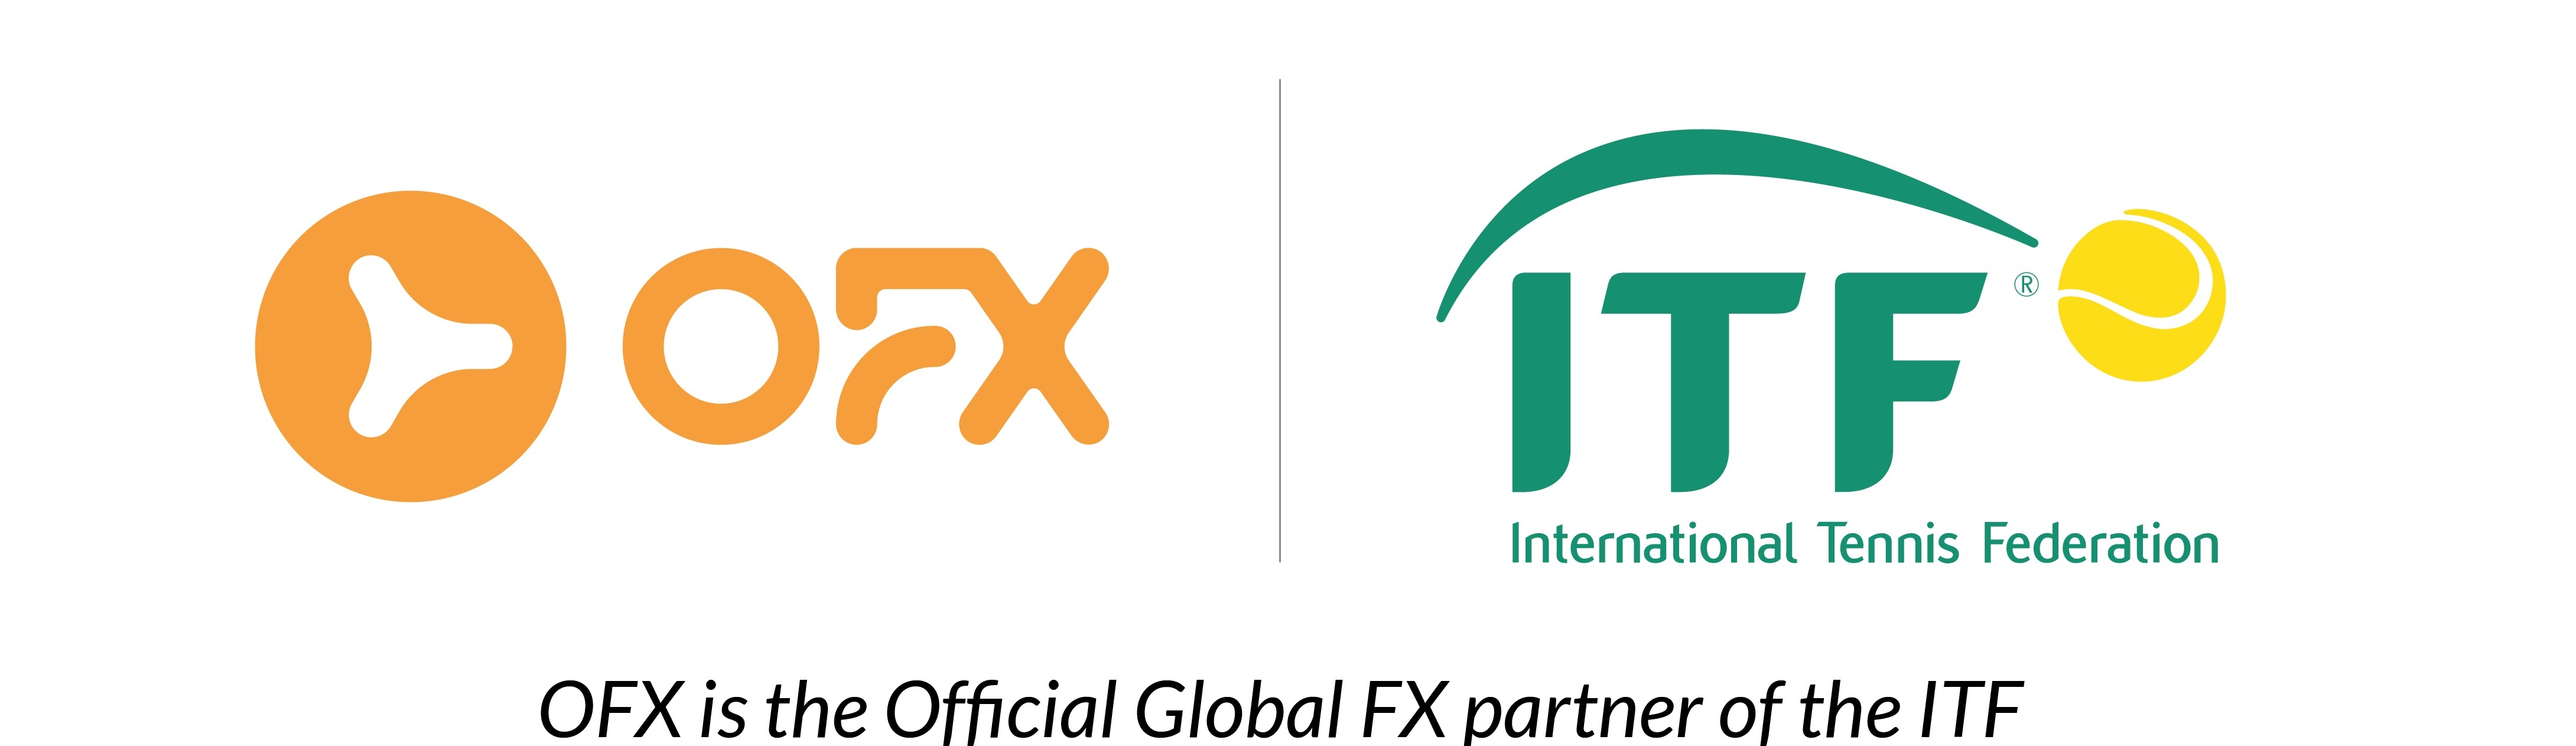 Global Fx Partner Of The Itf